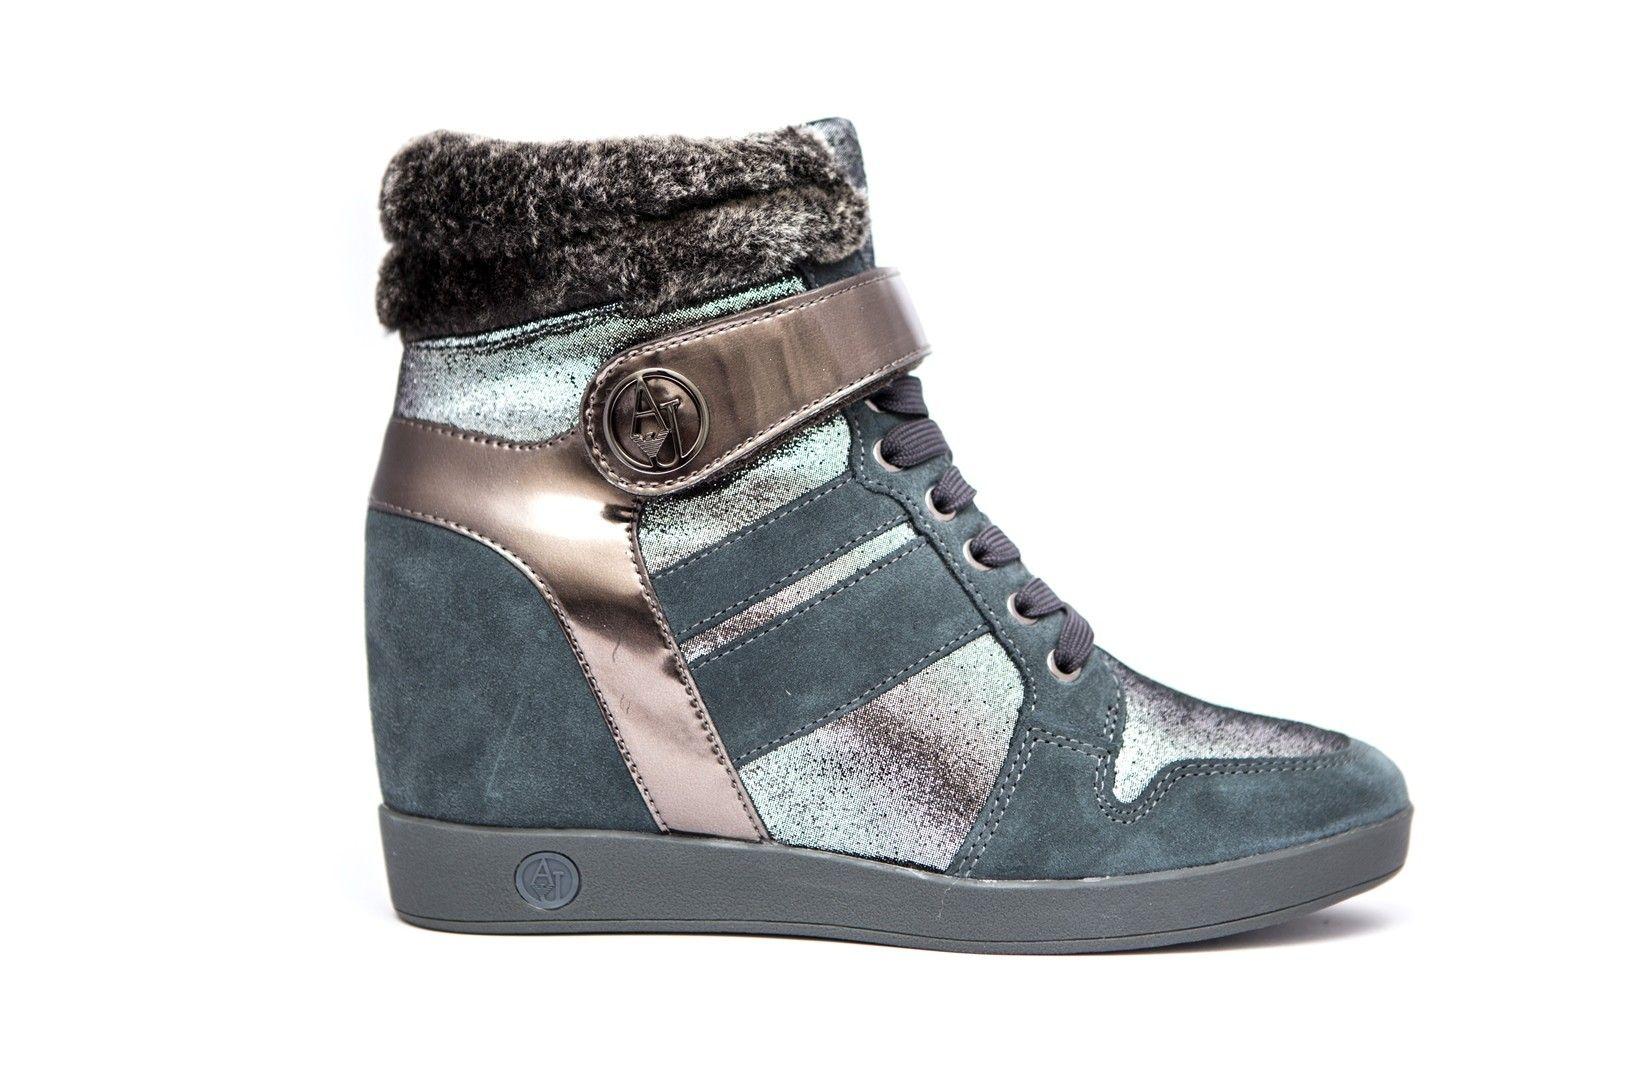 ee9b597941132 Armani Jeans Buty D. Sneaker Antracite 39 - 6956426889 - oficjalne ...